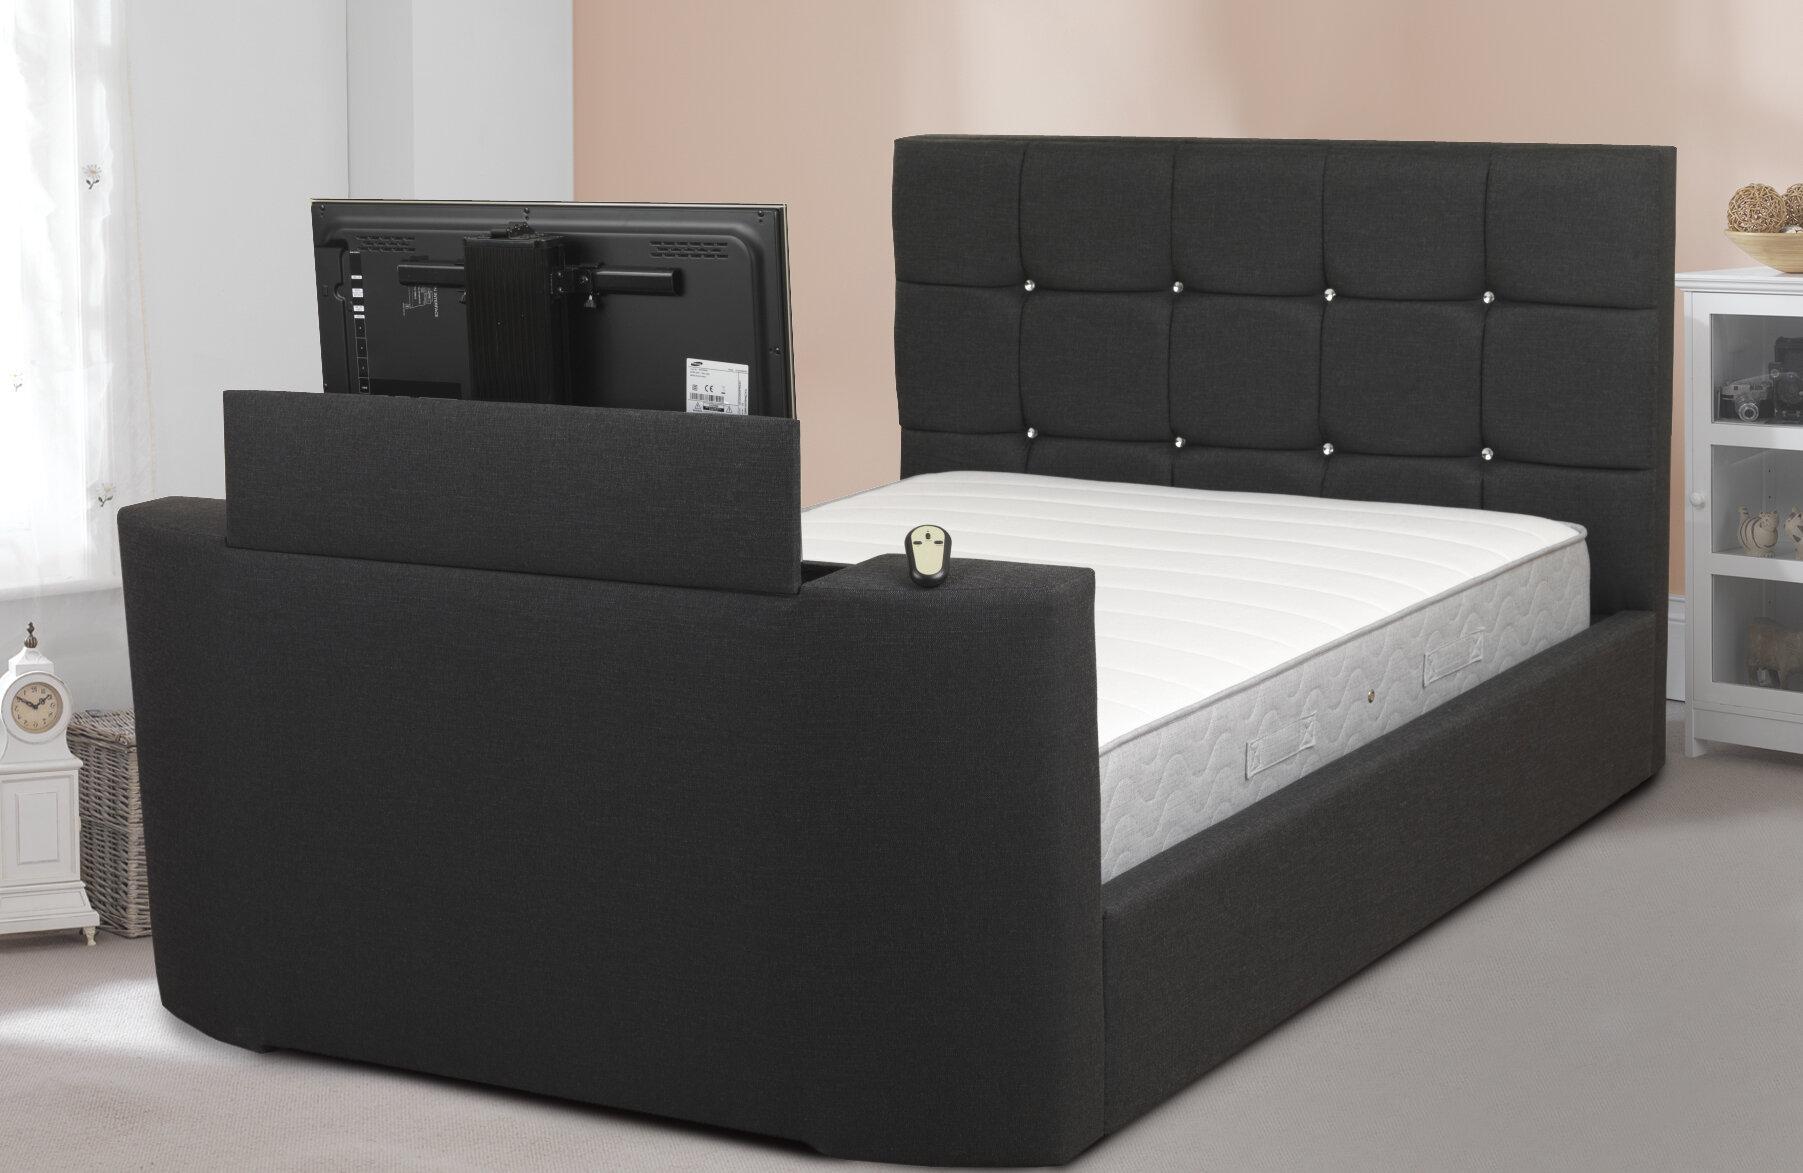 Tv In Bed : Tv bed frame in rochester kent gumtree